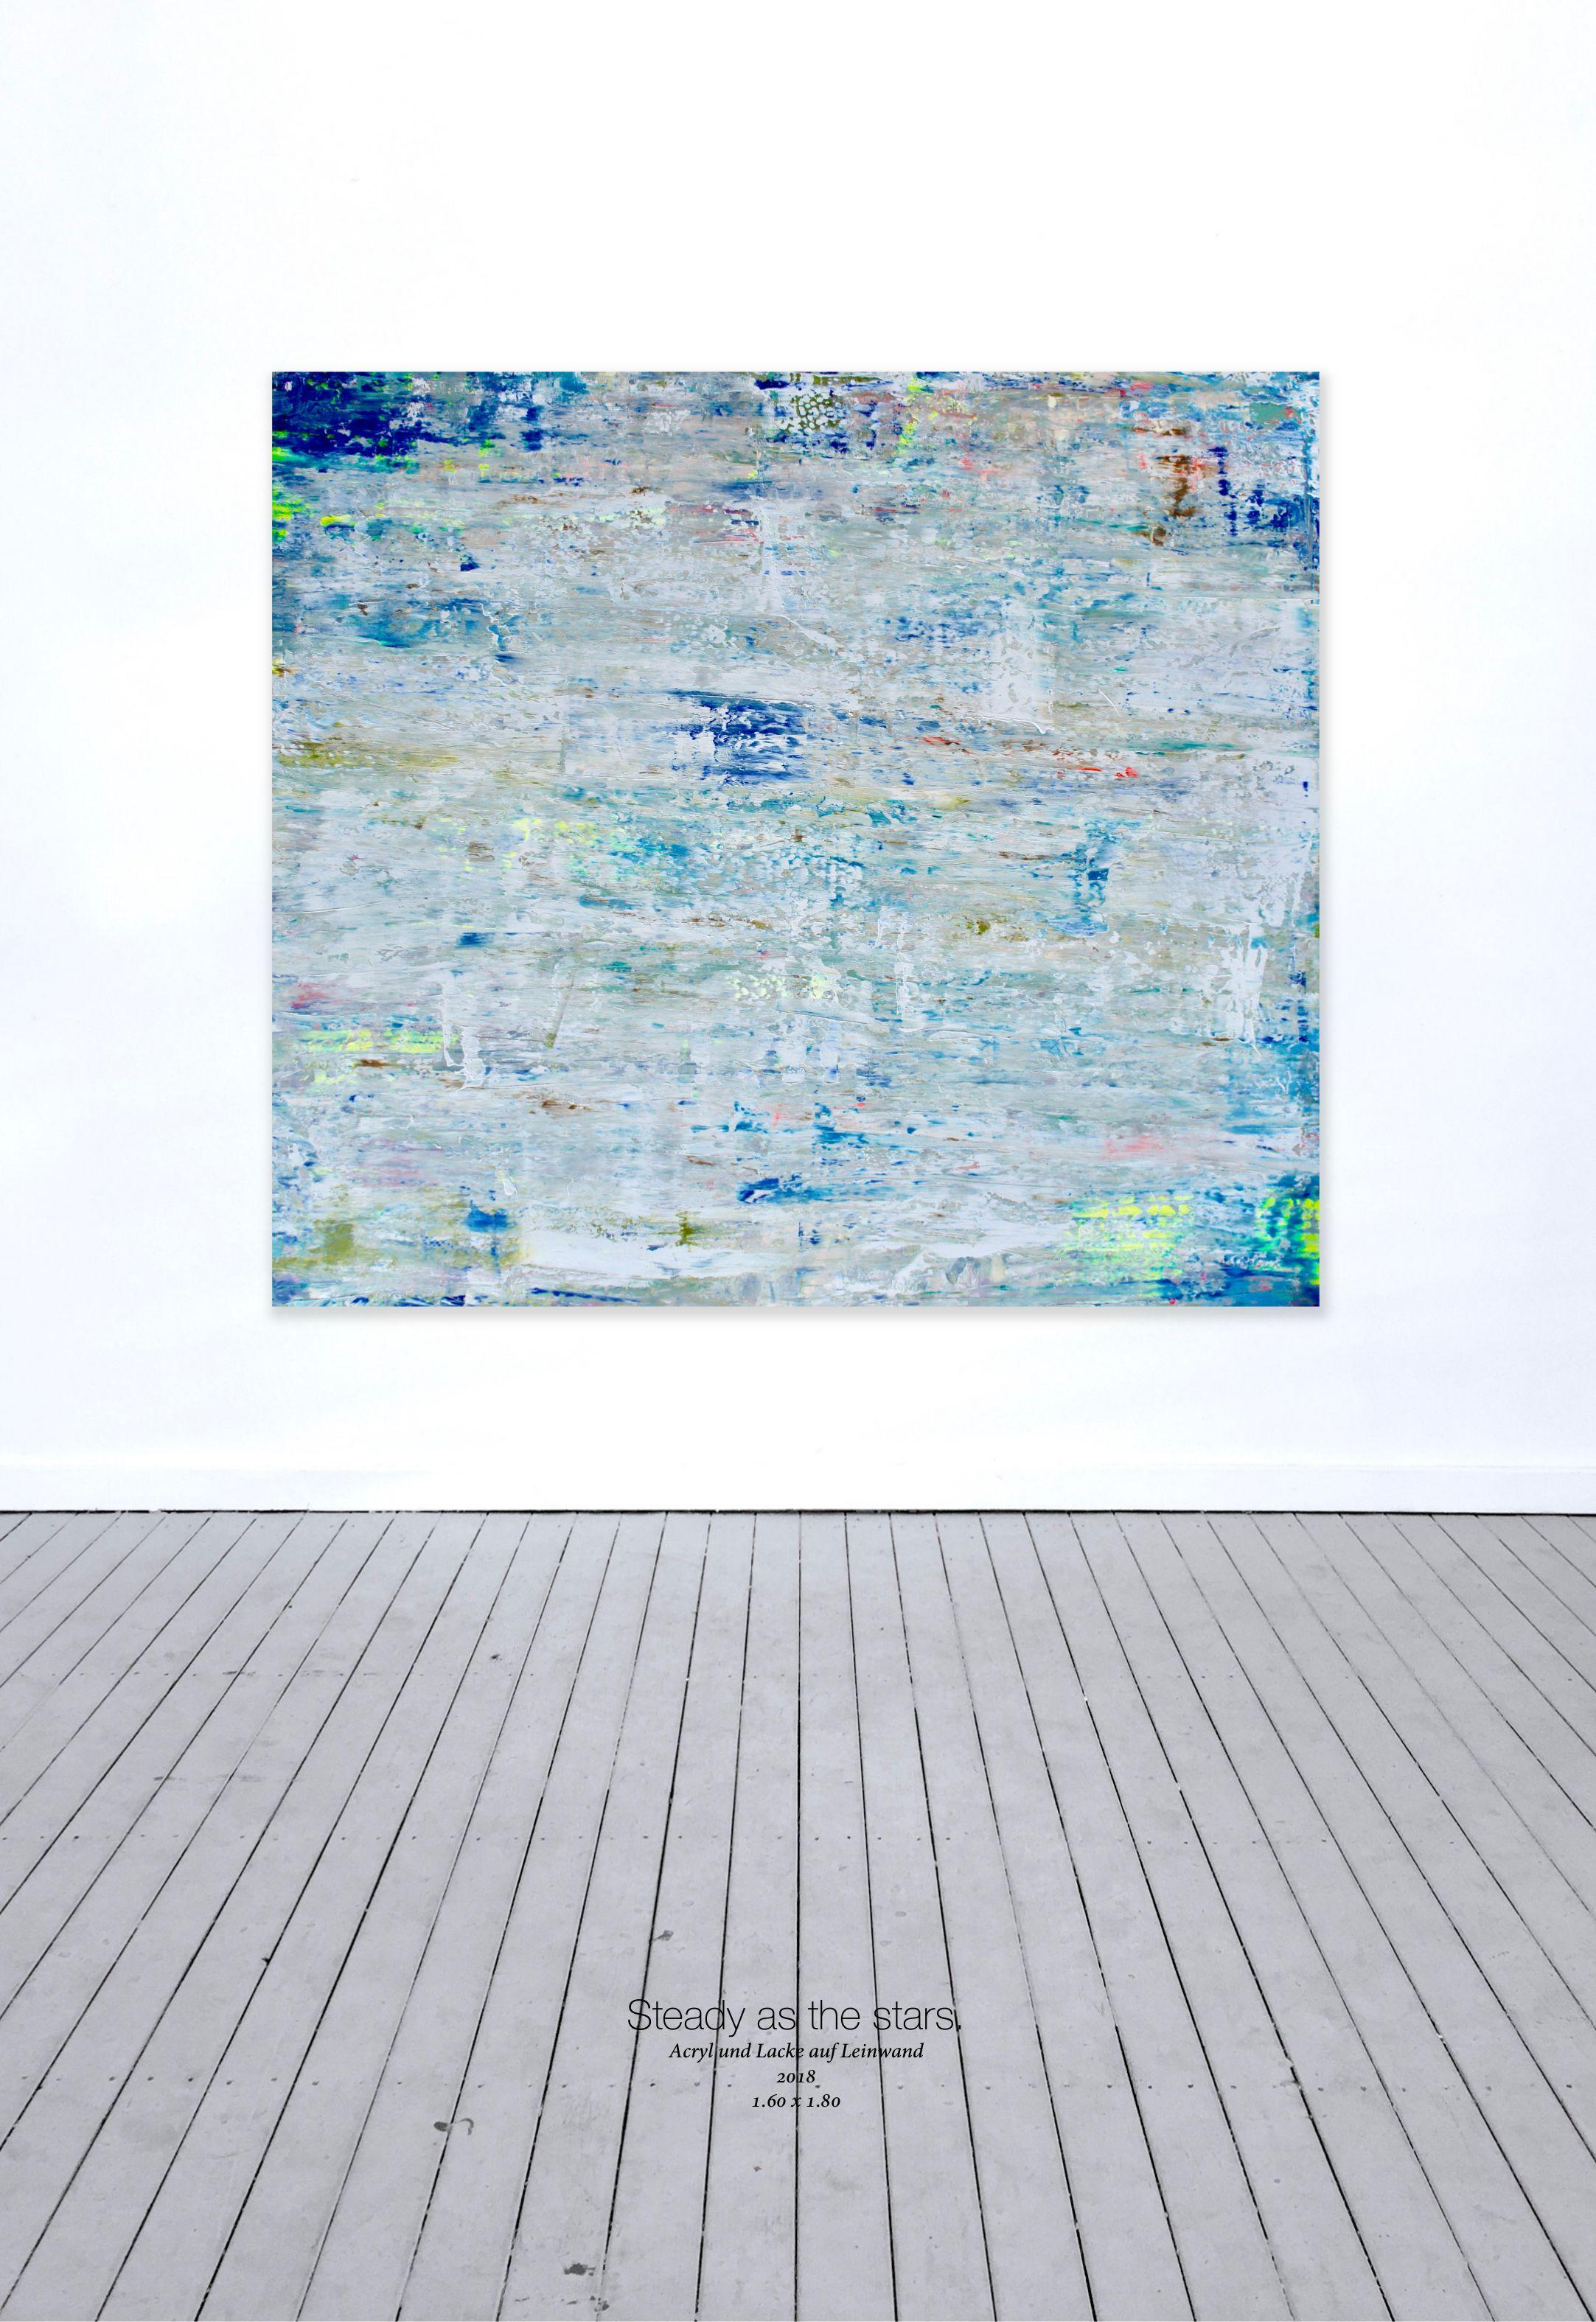 THERESA KALLRATH BEAUX ART PARIS KUNSTAKADEMIE DÜSSELDORF ARTIST ABSTRAKT RUNDGANG 2018 WALL